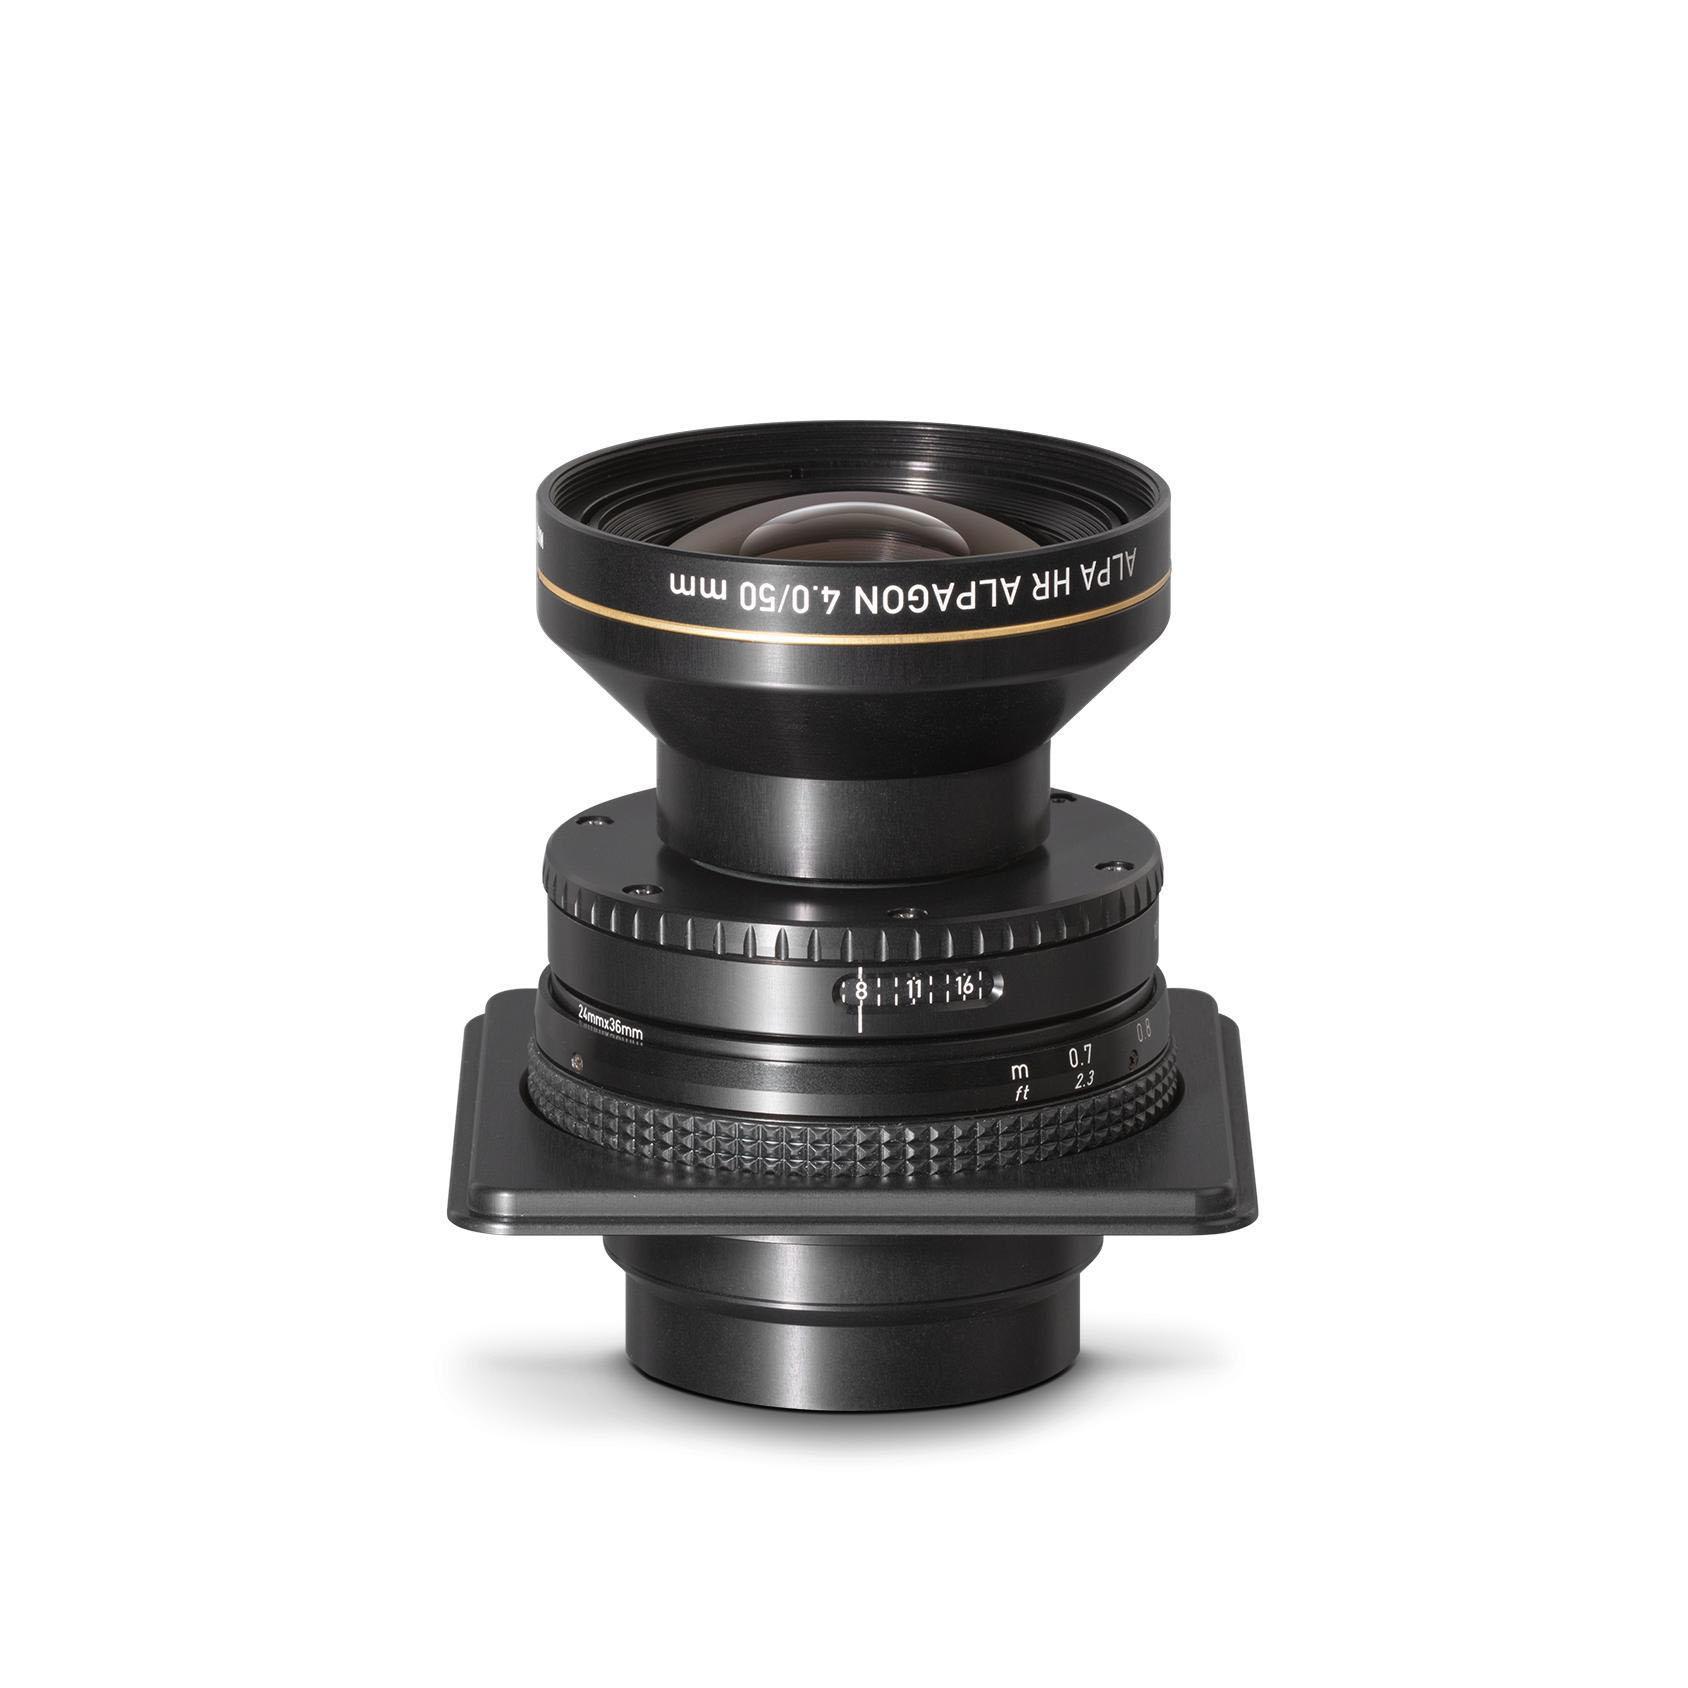 Rodenstock / ALPA HR Alpagon 4.0/50 mm, SB34, in Aperture Unit